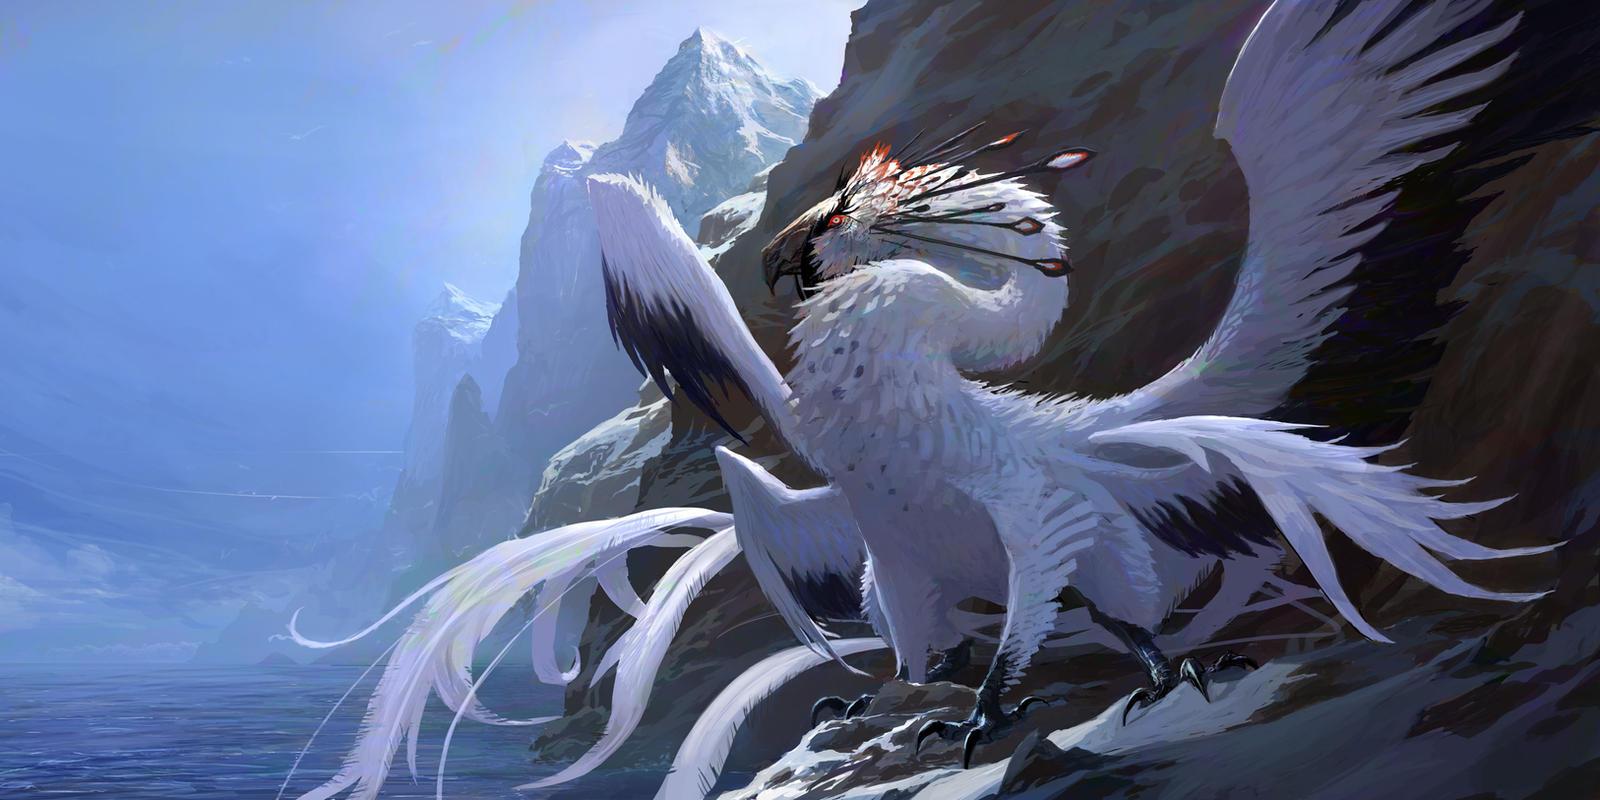 White Dragon By Mobius 9 On Deviantart